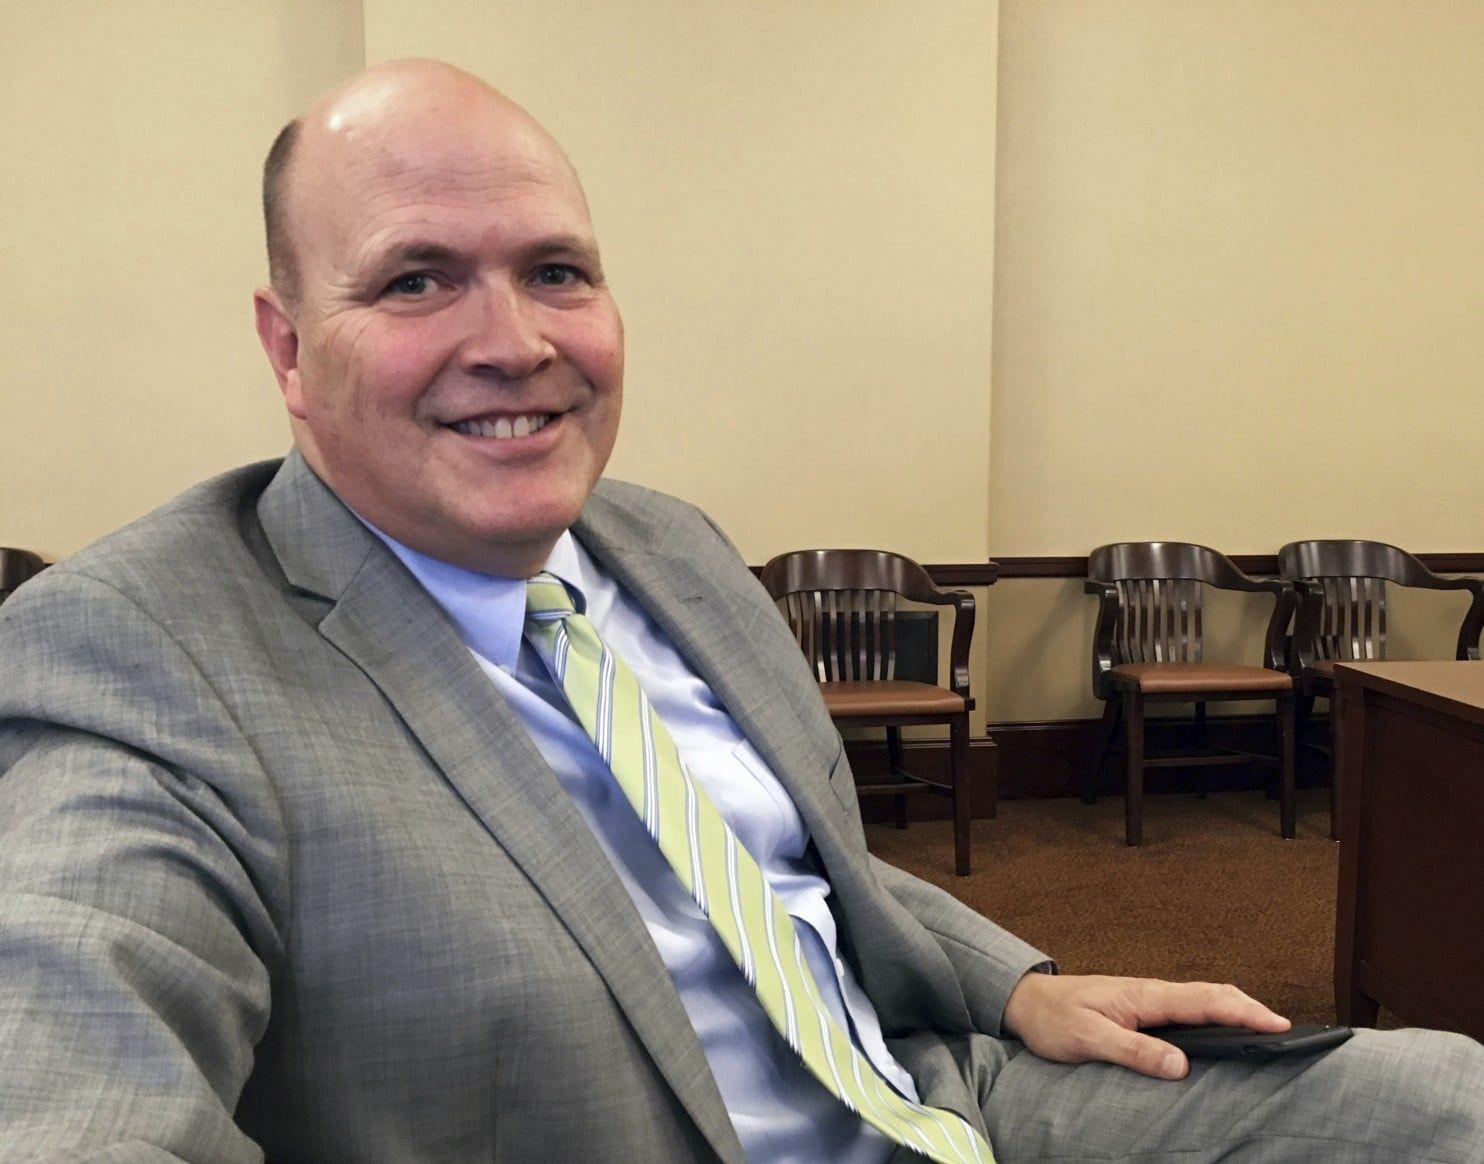 Utah lawmakers on Wednesday the Mormon church